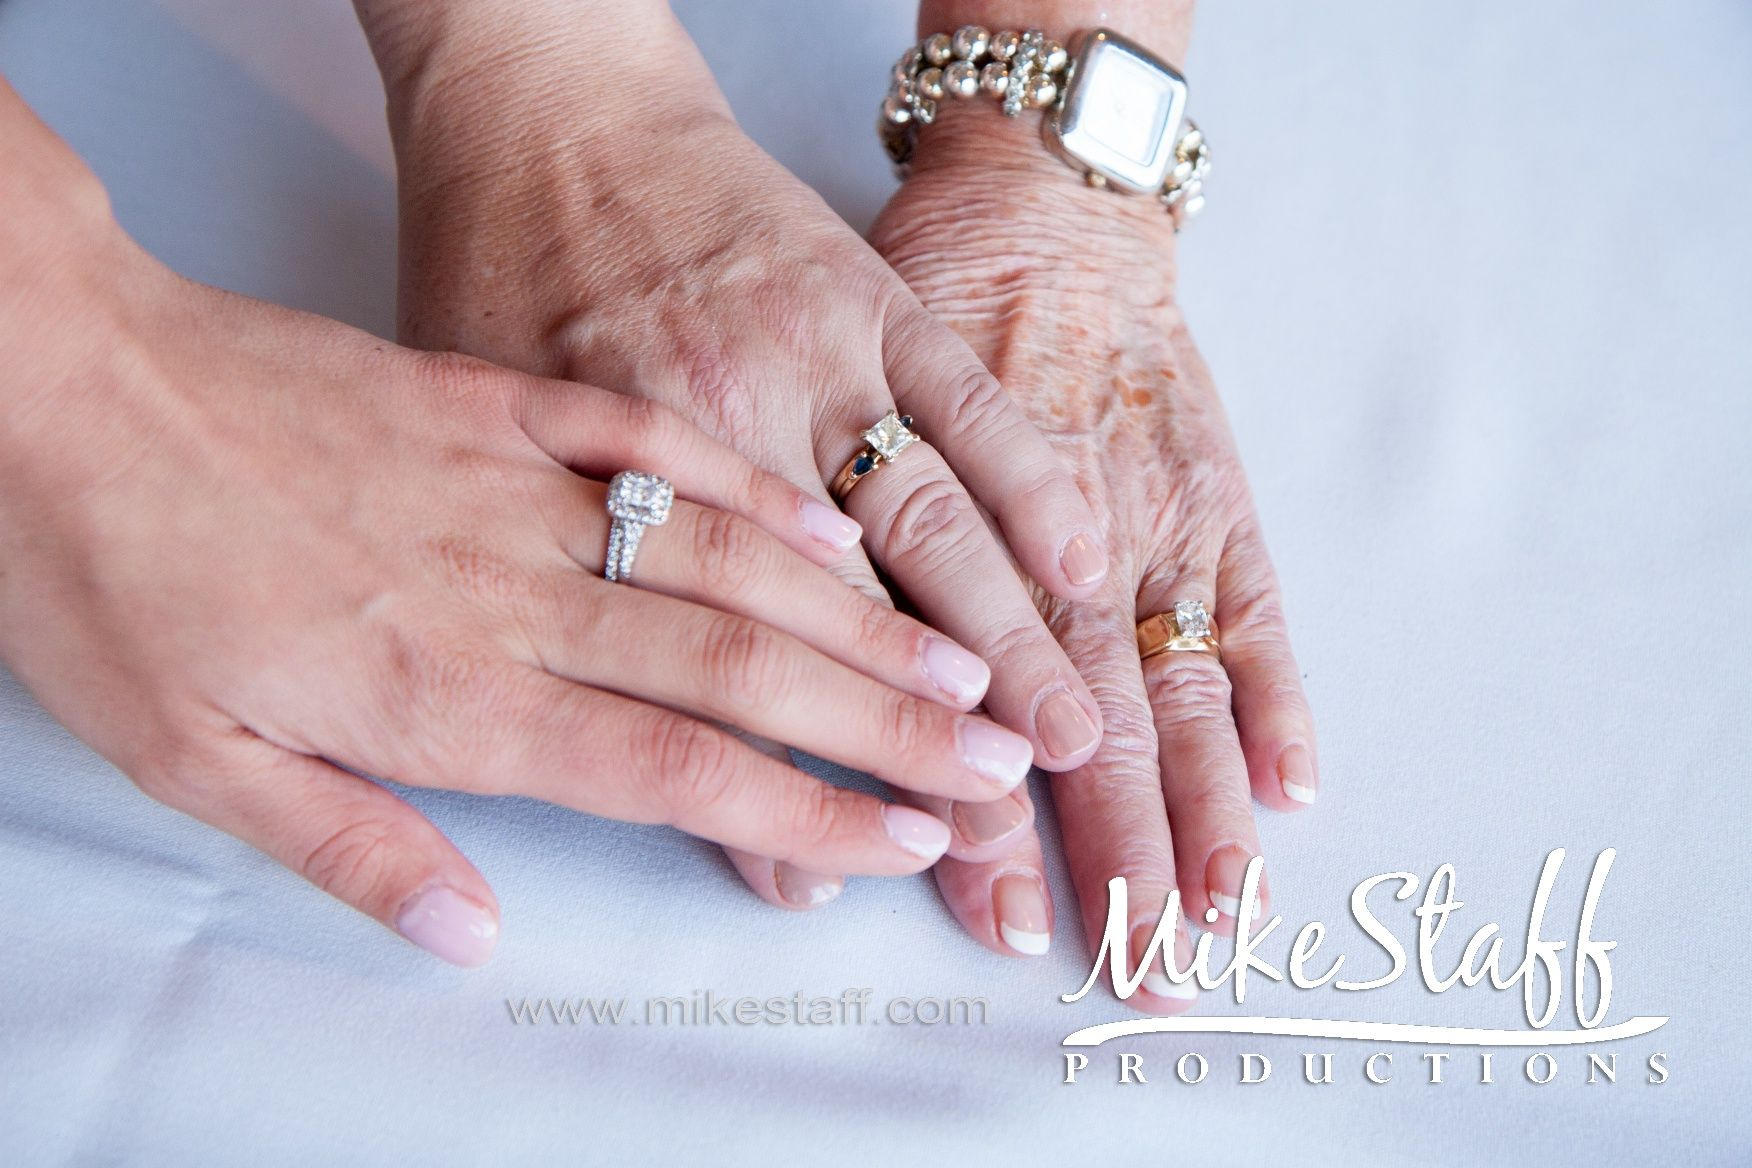 Generation hands picture | Engagement/Wedding Pic Ideas | Pinterest ...